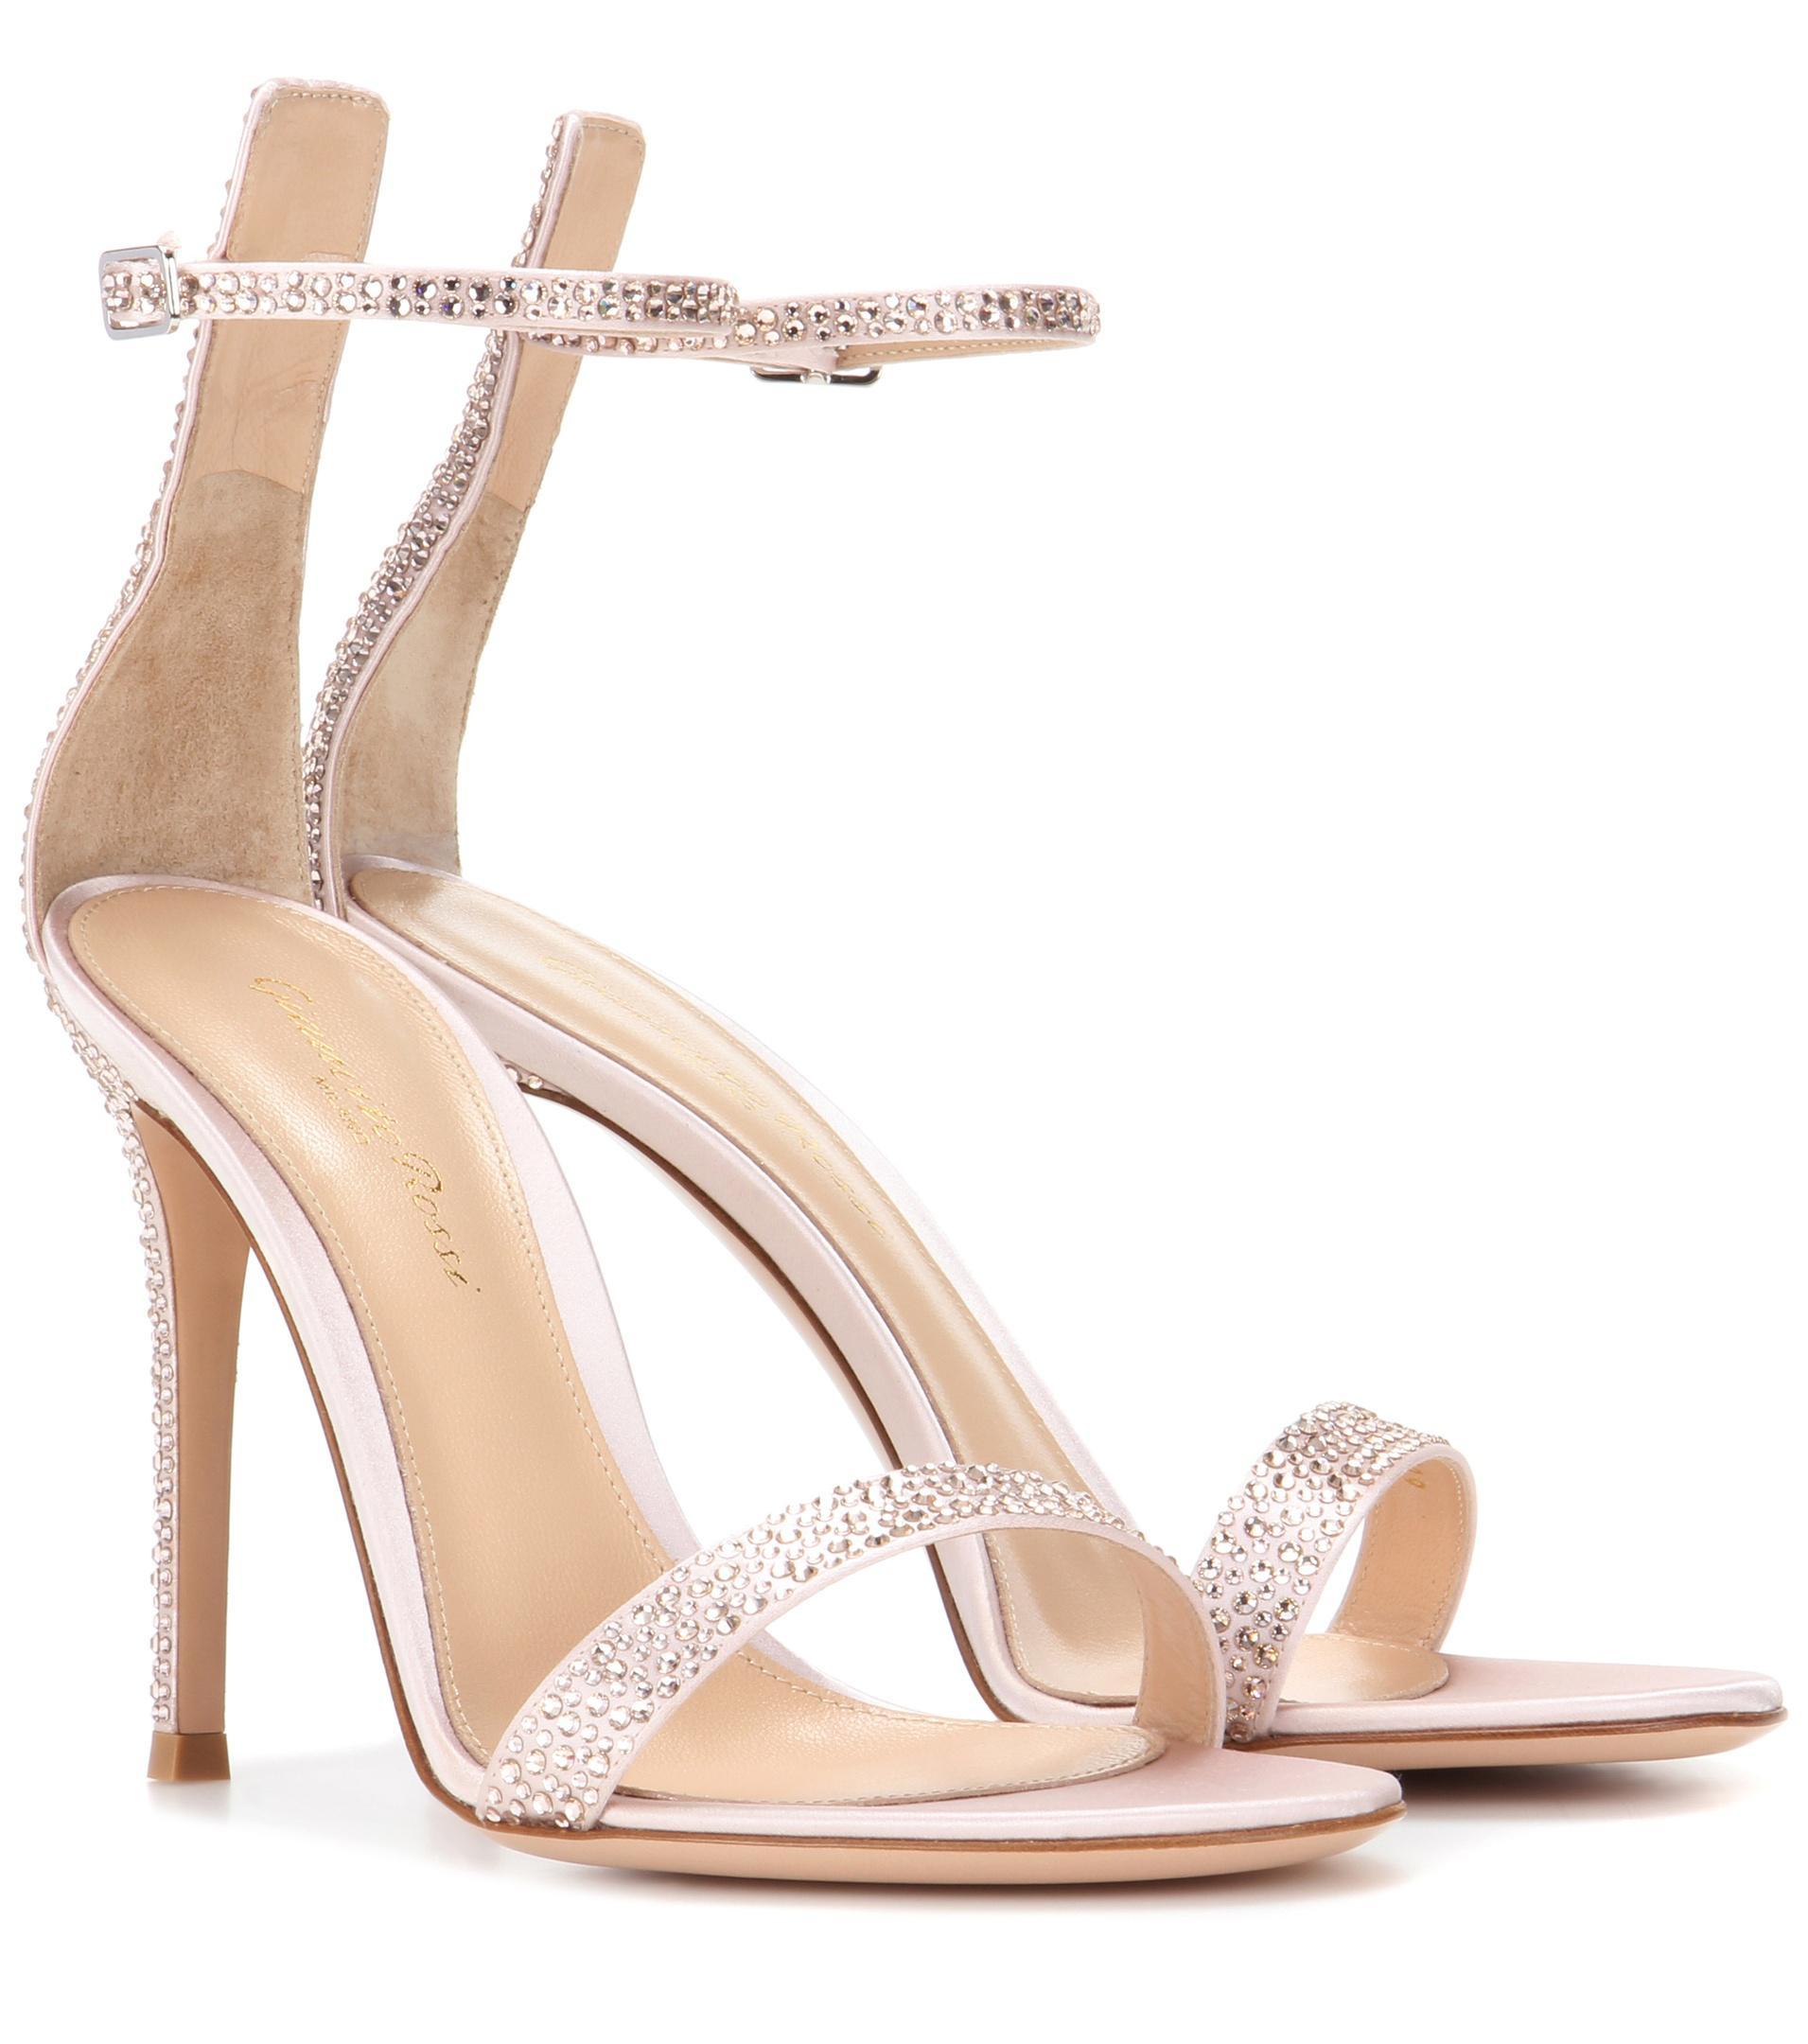 Gianvito Rossi. Women's Pink Portofino Embellished Satin Sandals